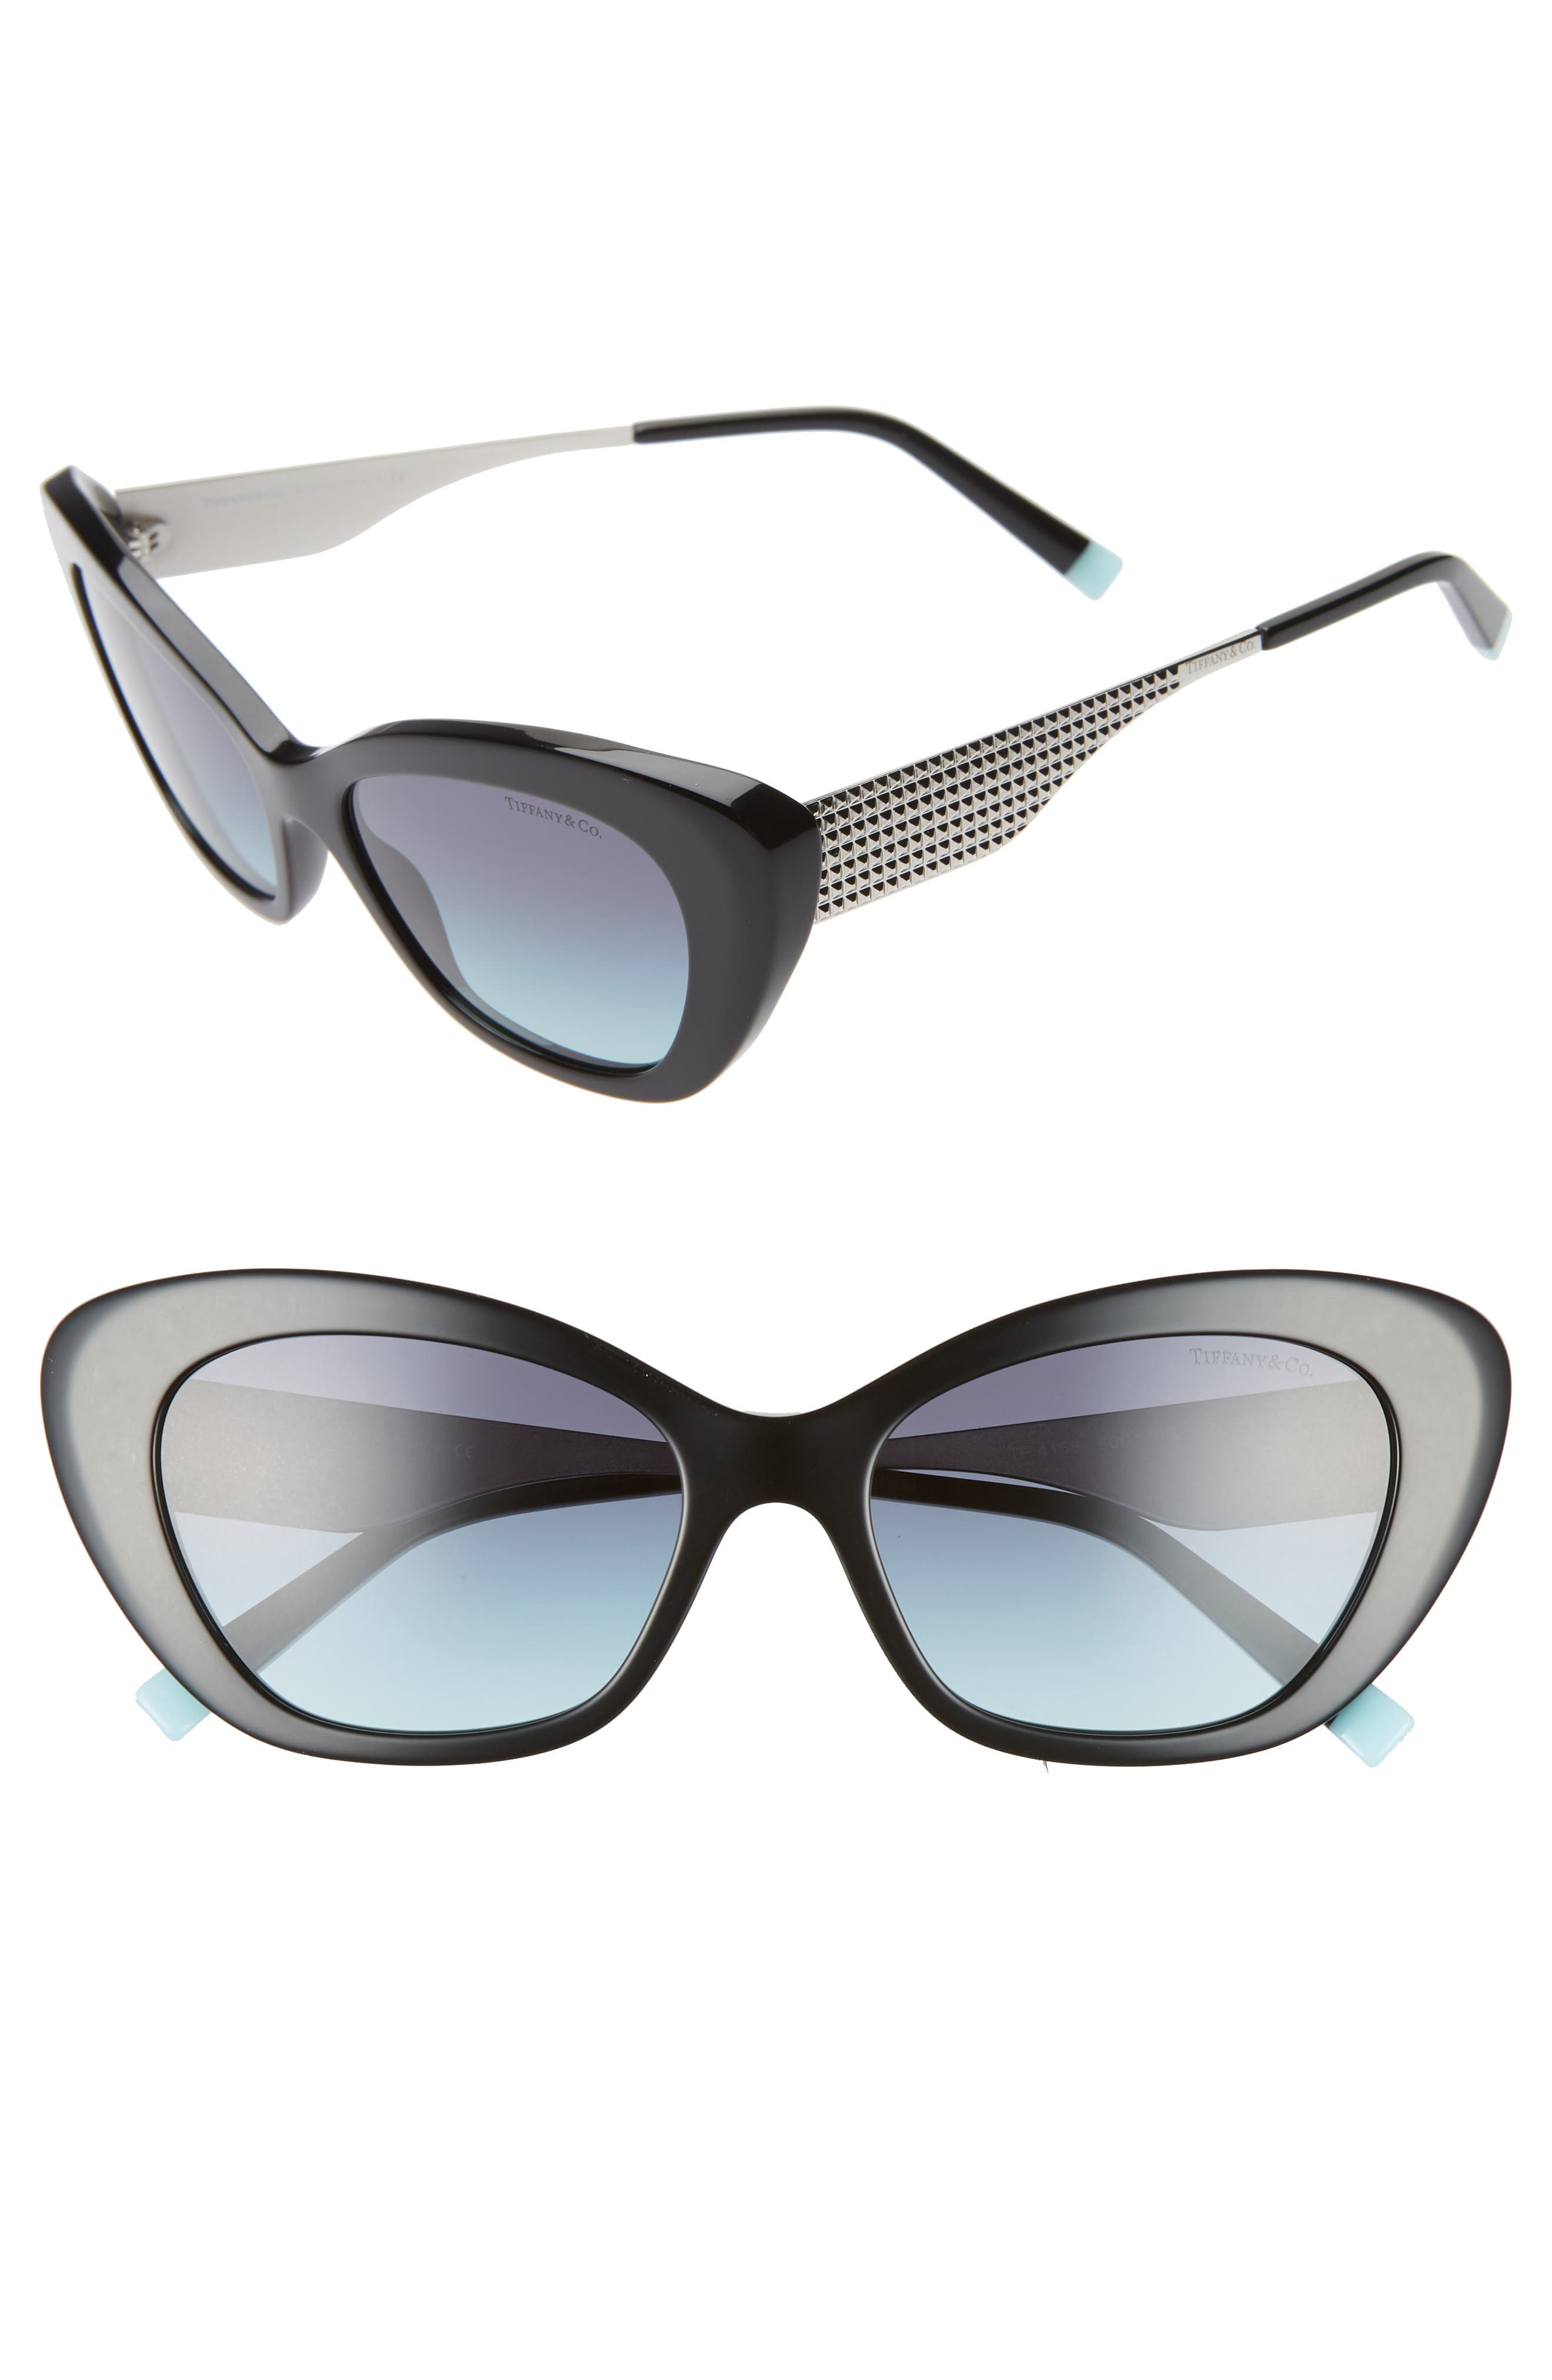 5891af6db4e Women s Tiffany   Co. Diamond Point 54Mm Gradient Cat Eye Sunglasses -